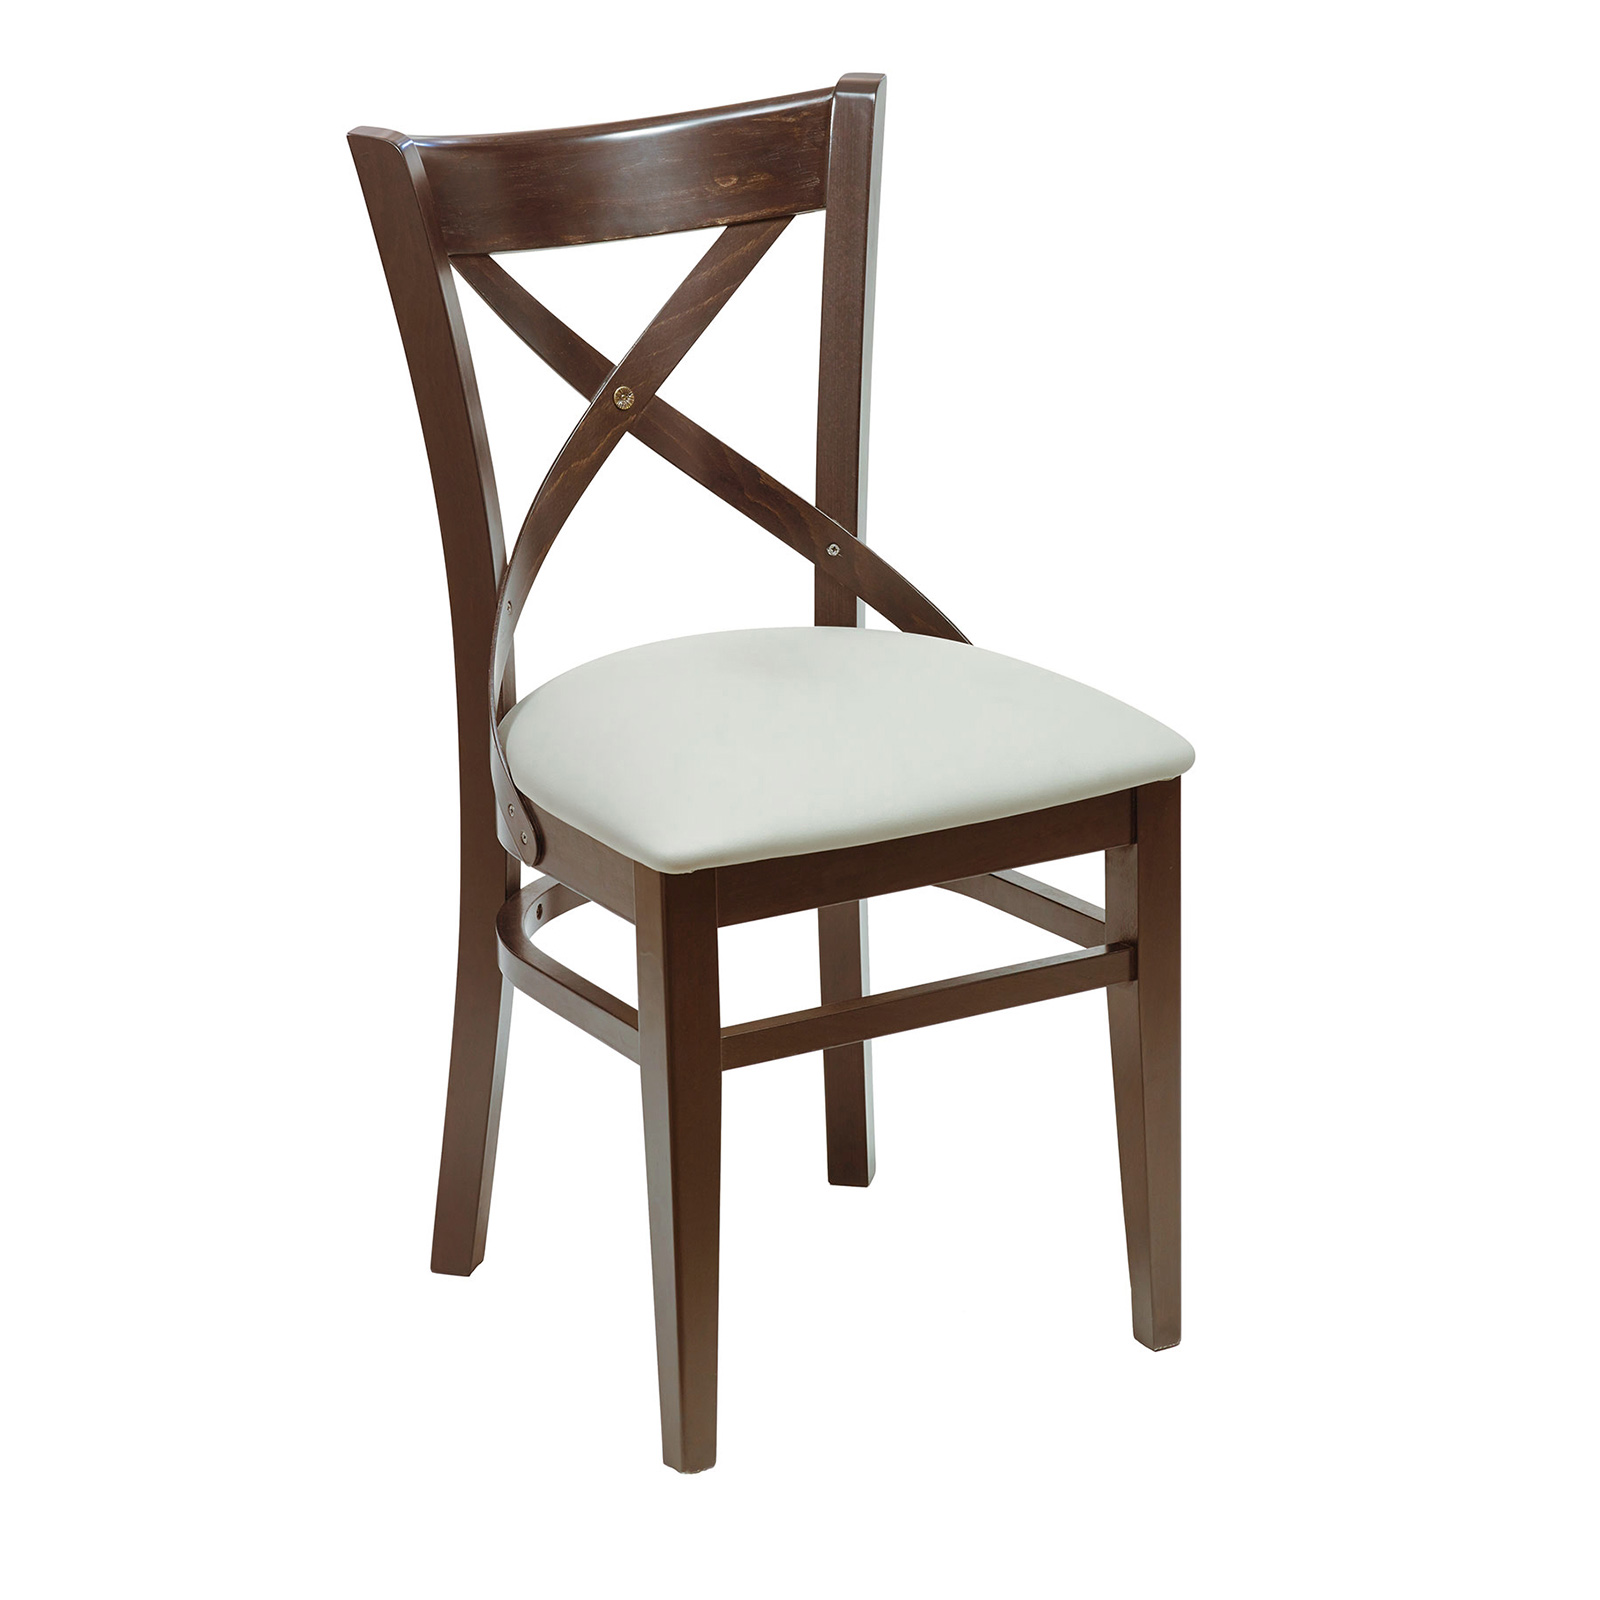 Florida Seating FLS-16S GR5 chair, side, indoor